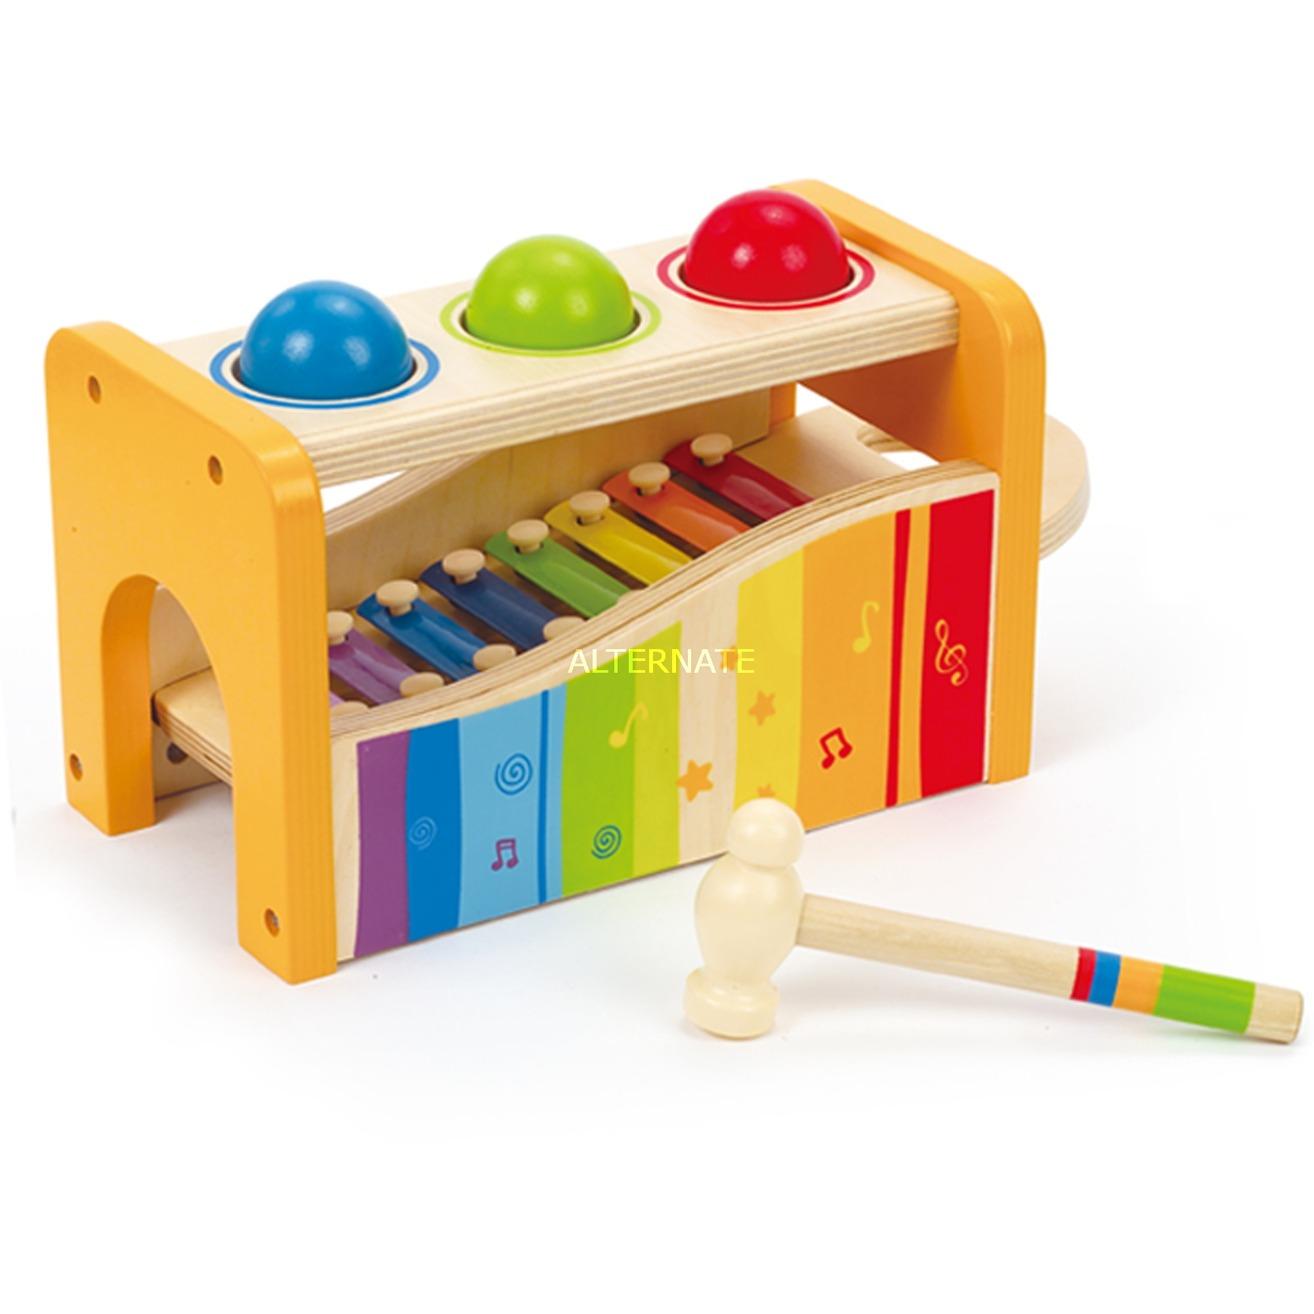 E0305 juguete musical, Juguetes musicales